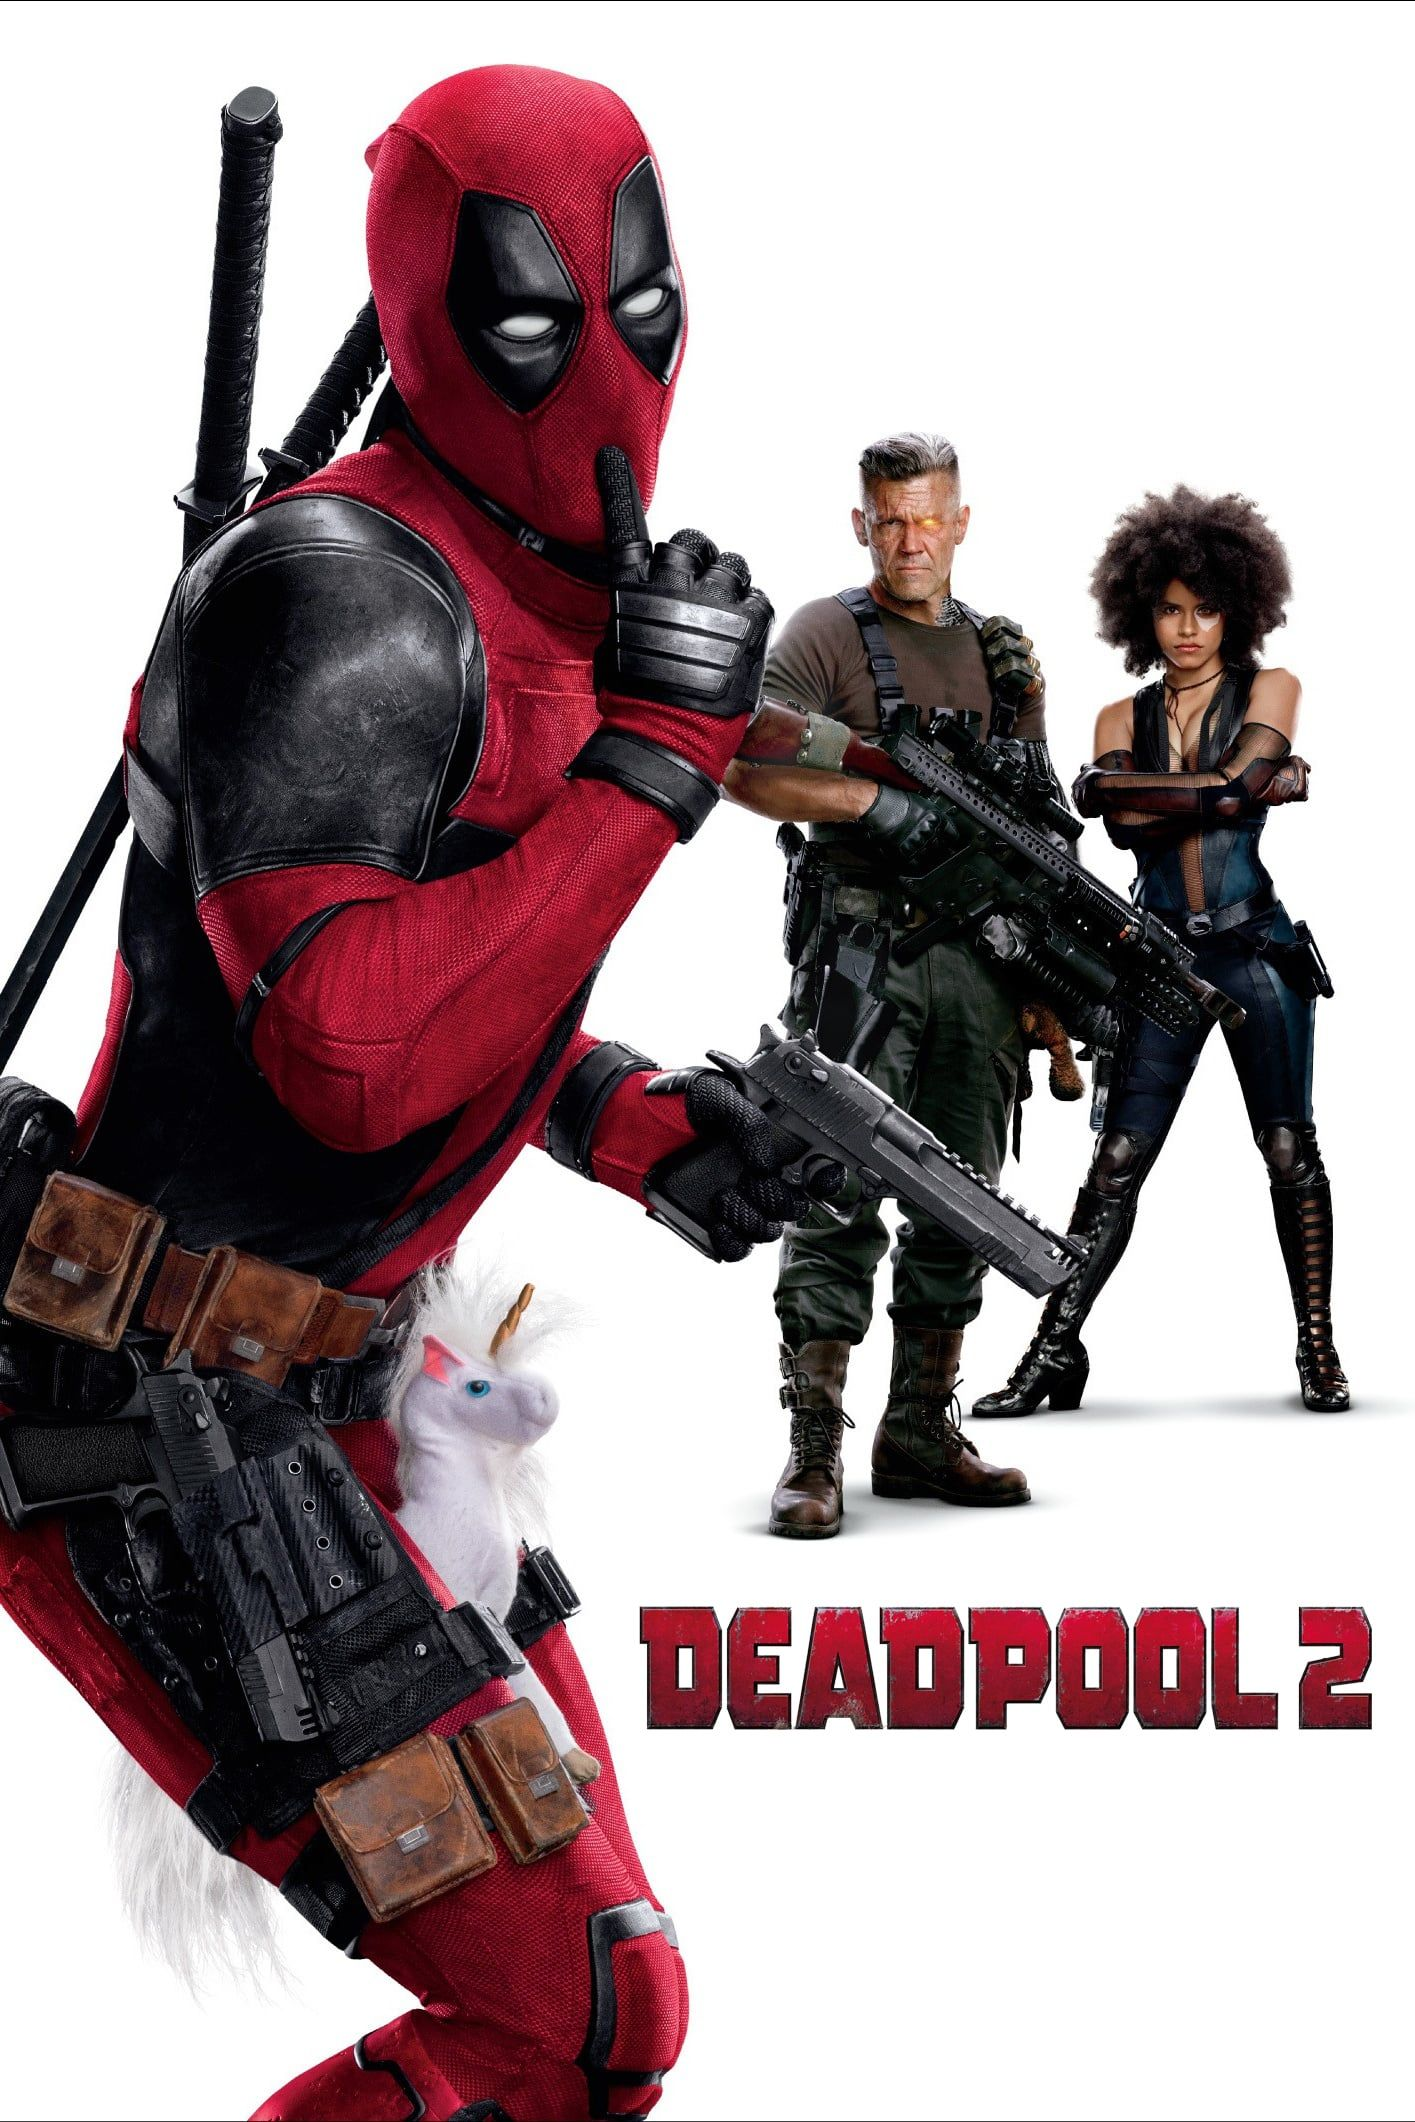 Deadpool 2 Pelicula completa en español latino HD